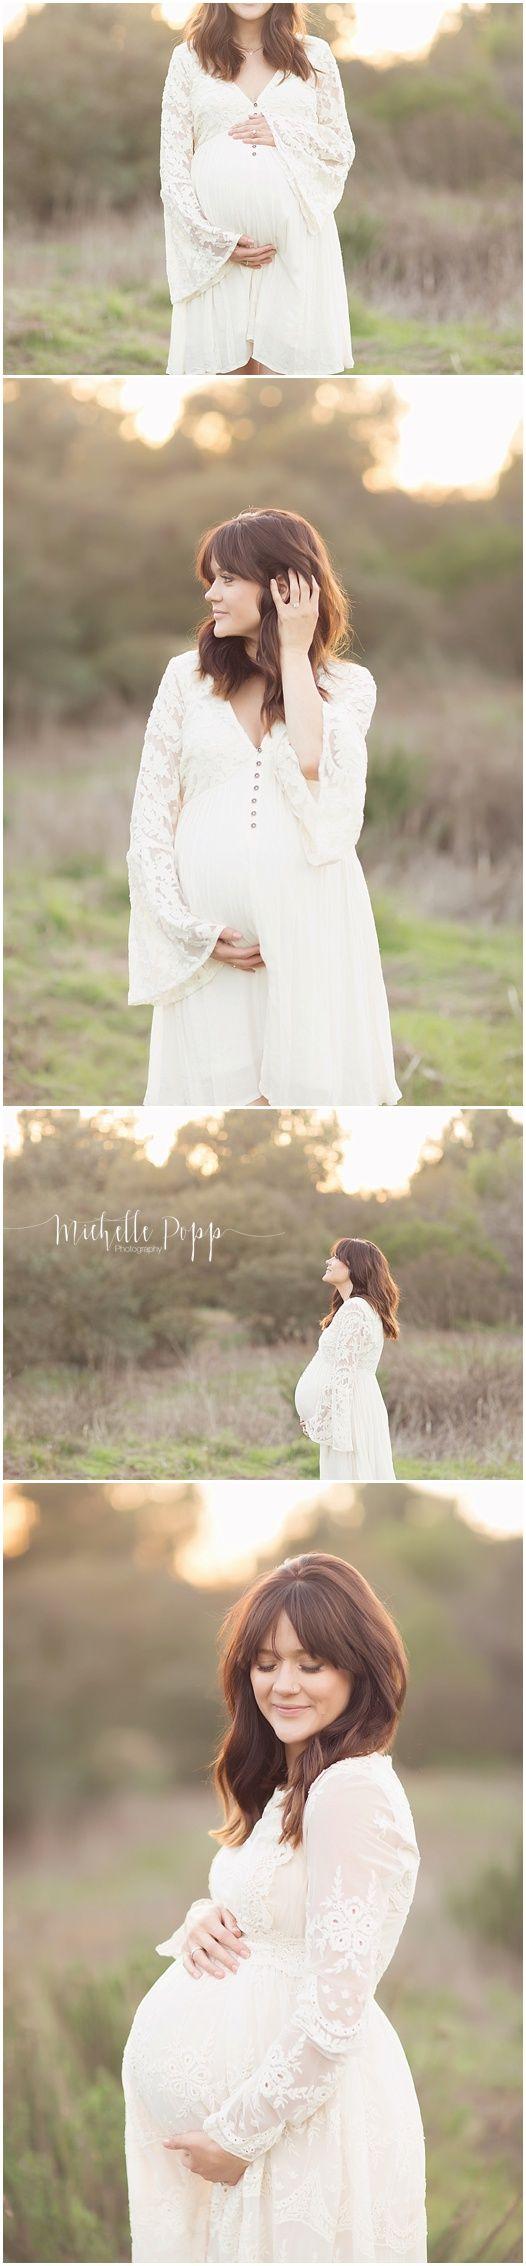 San Diego Maternity Photographer | maternity photos. field, maternity photography http:∕∕www.michellepoppphotography.com